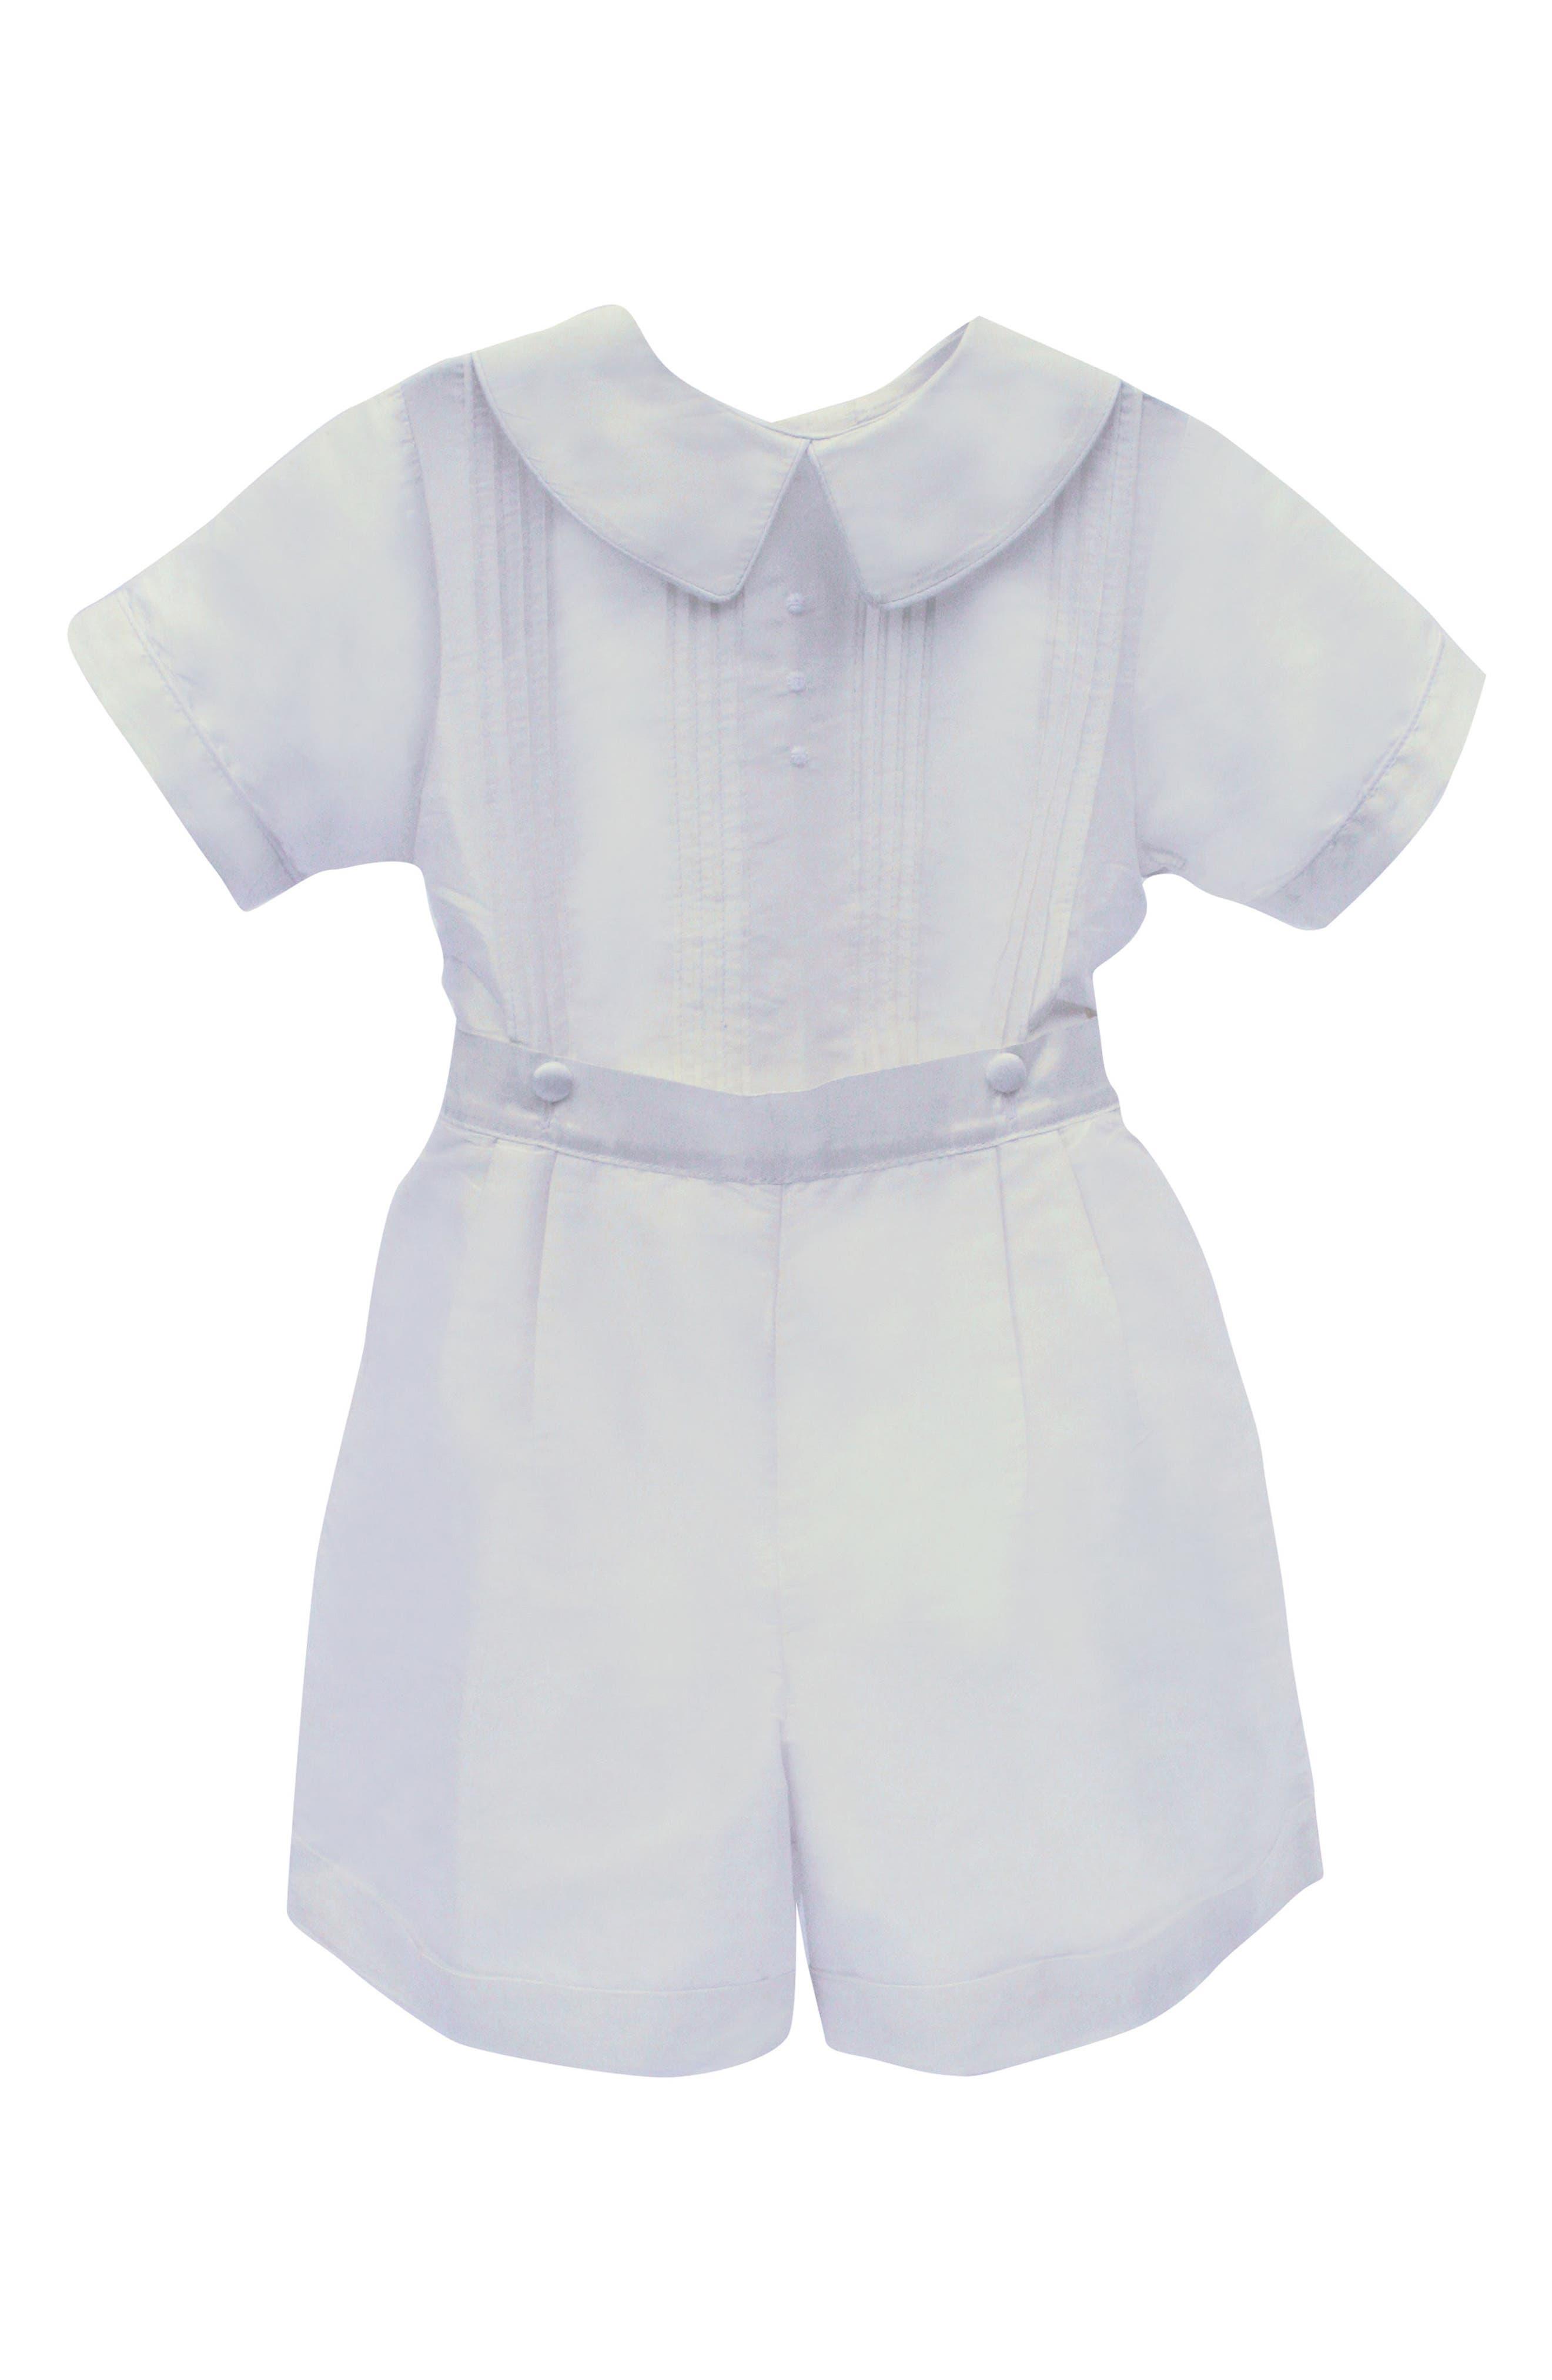 Sebastian Shirt & Shorts,                             Main thumbnail 1, color,                             White